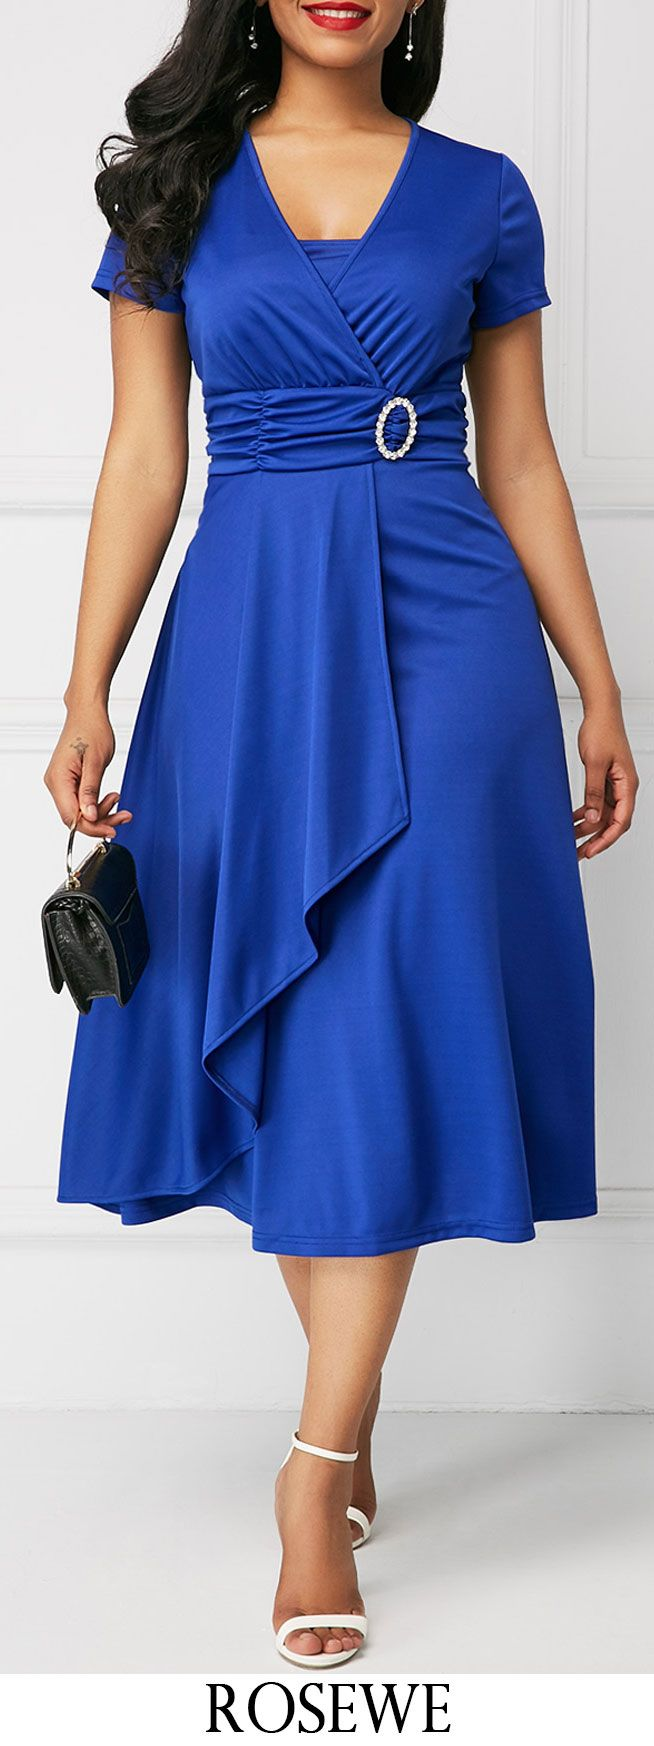 Asymmetric Hem V Neck Royal Blue Dress.#Rosewe#dress#blue